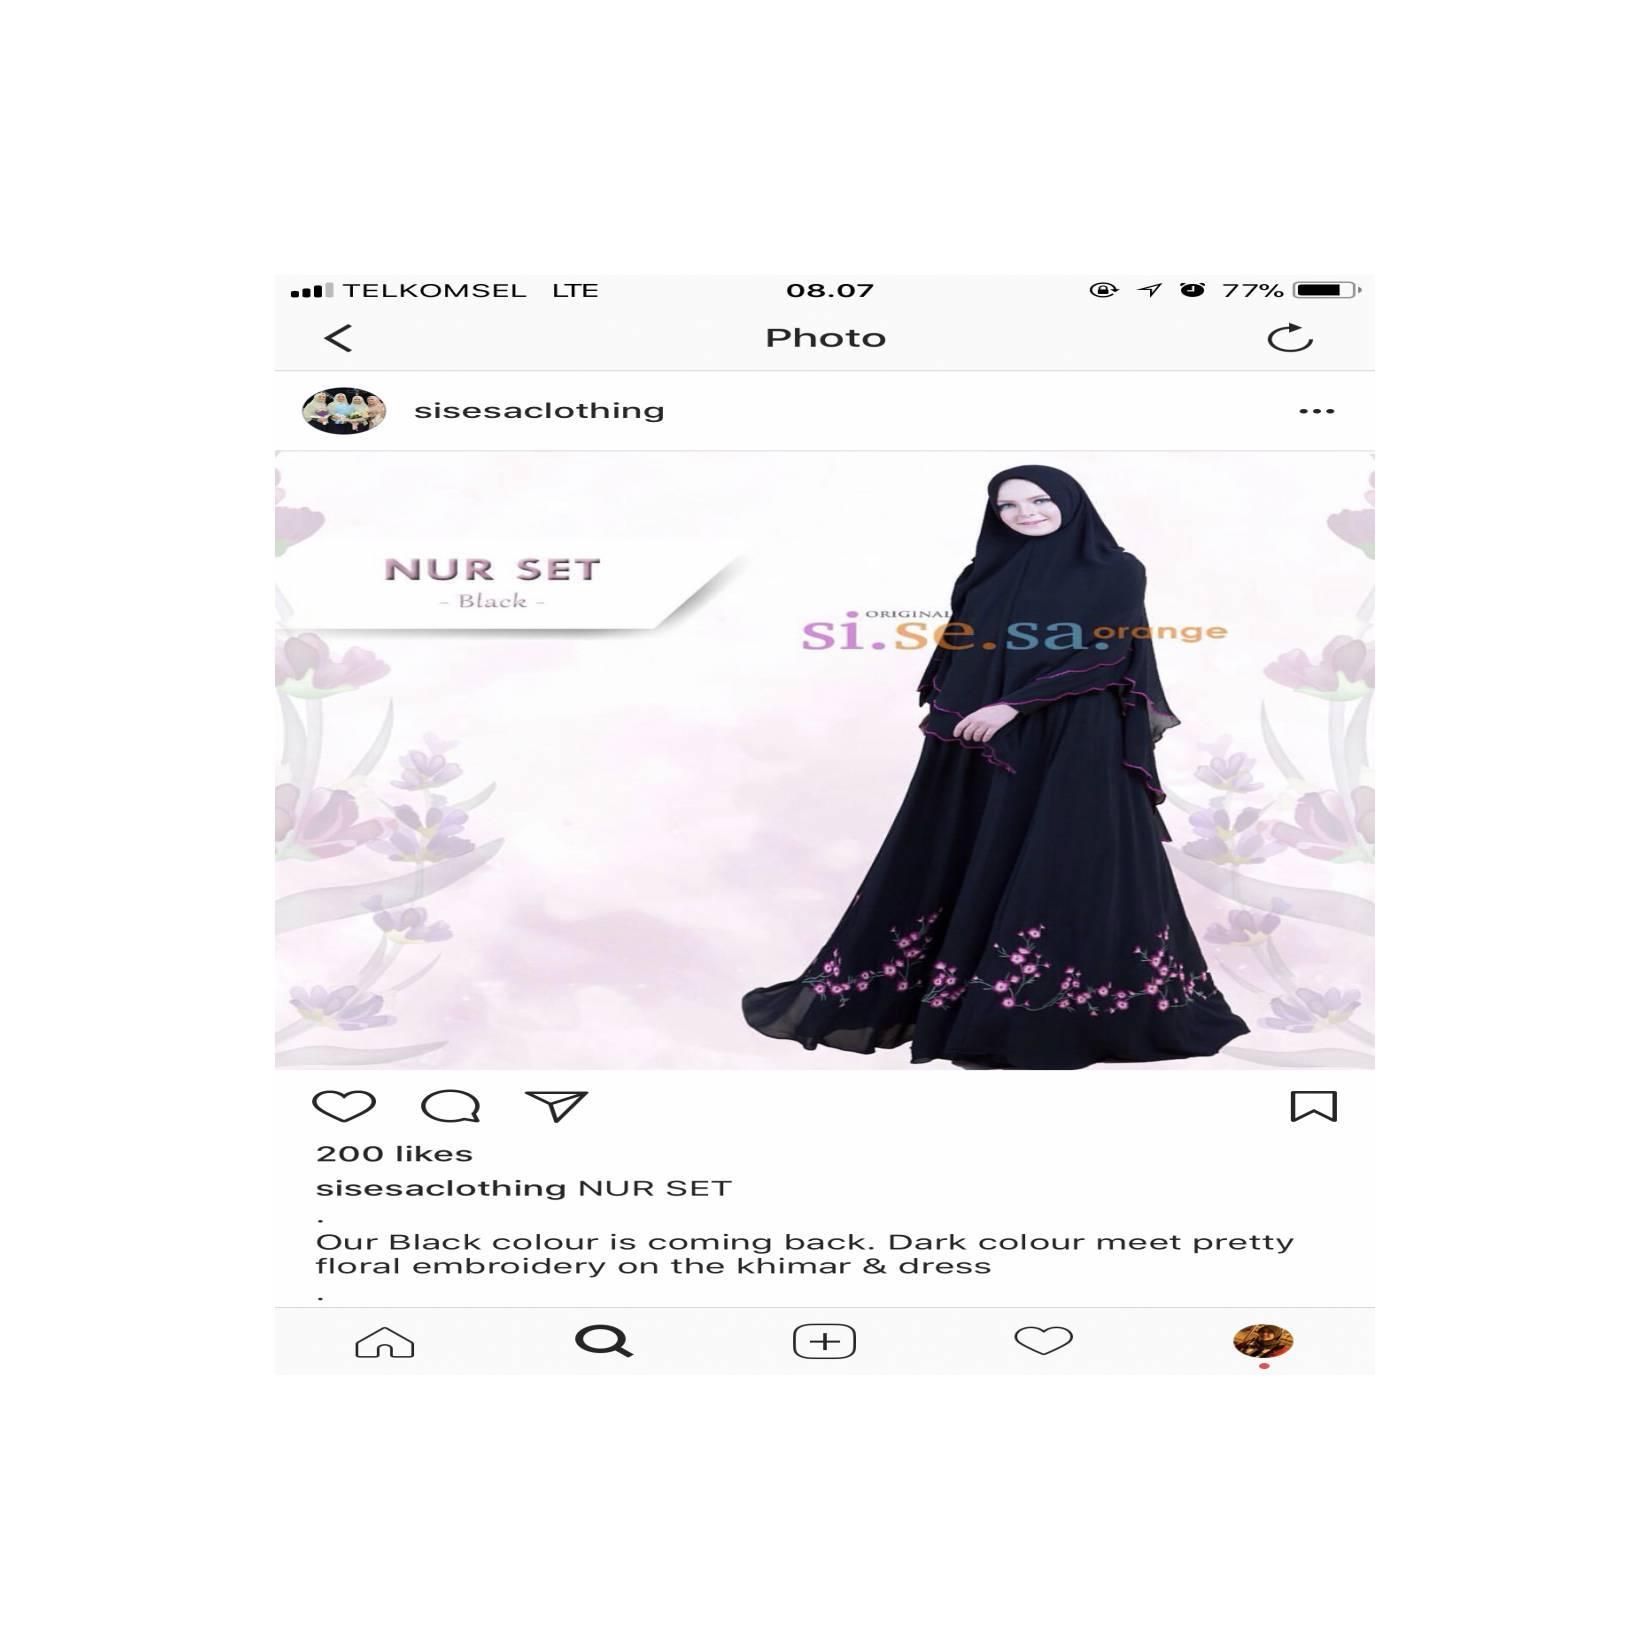 Sisesa clothing Nur Set dress with Khimar